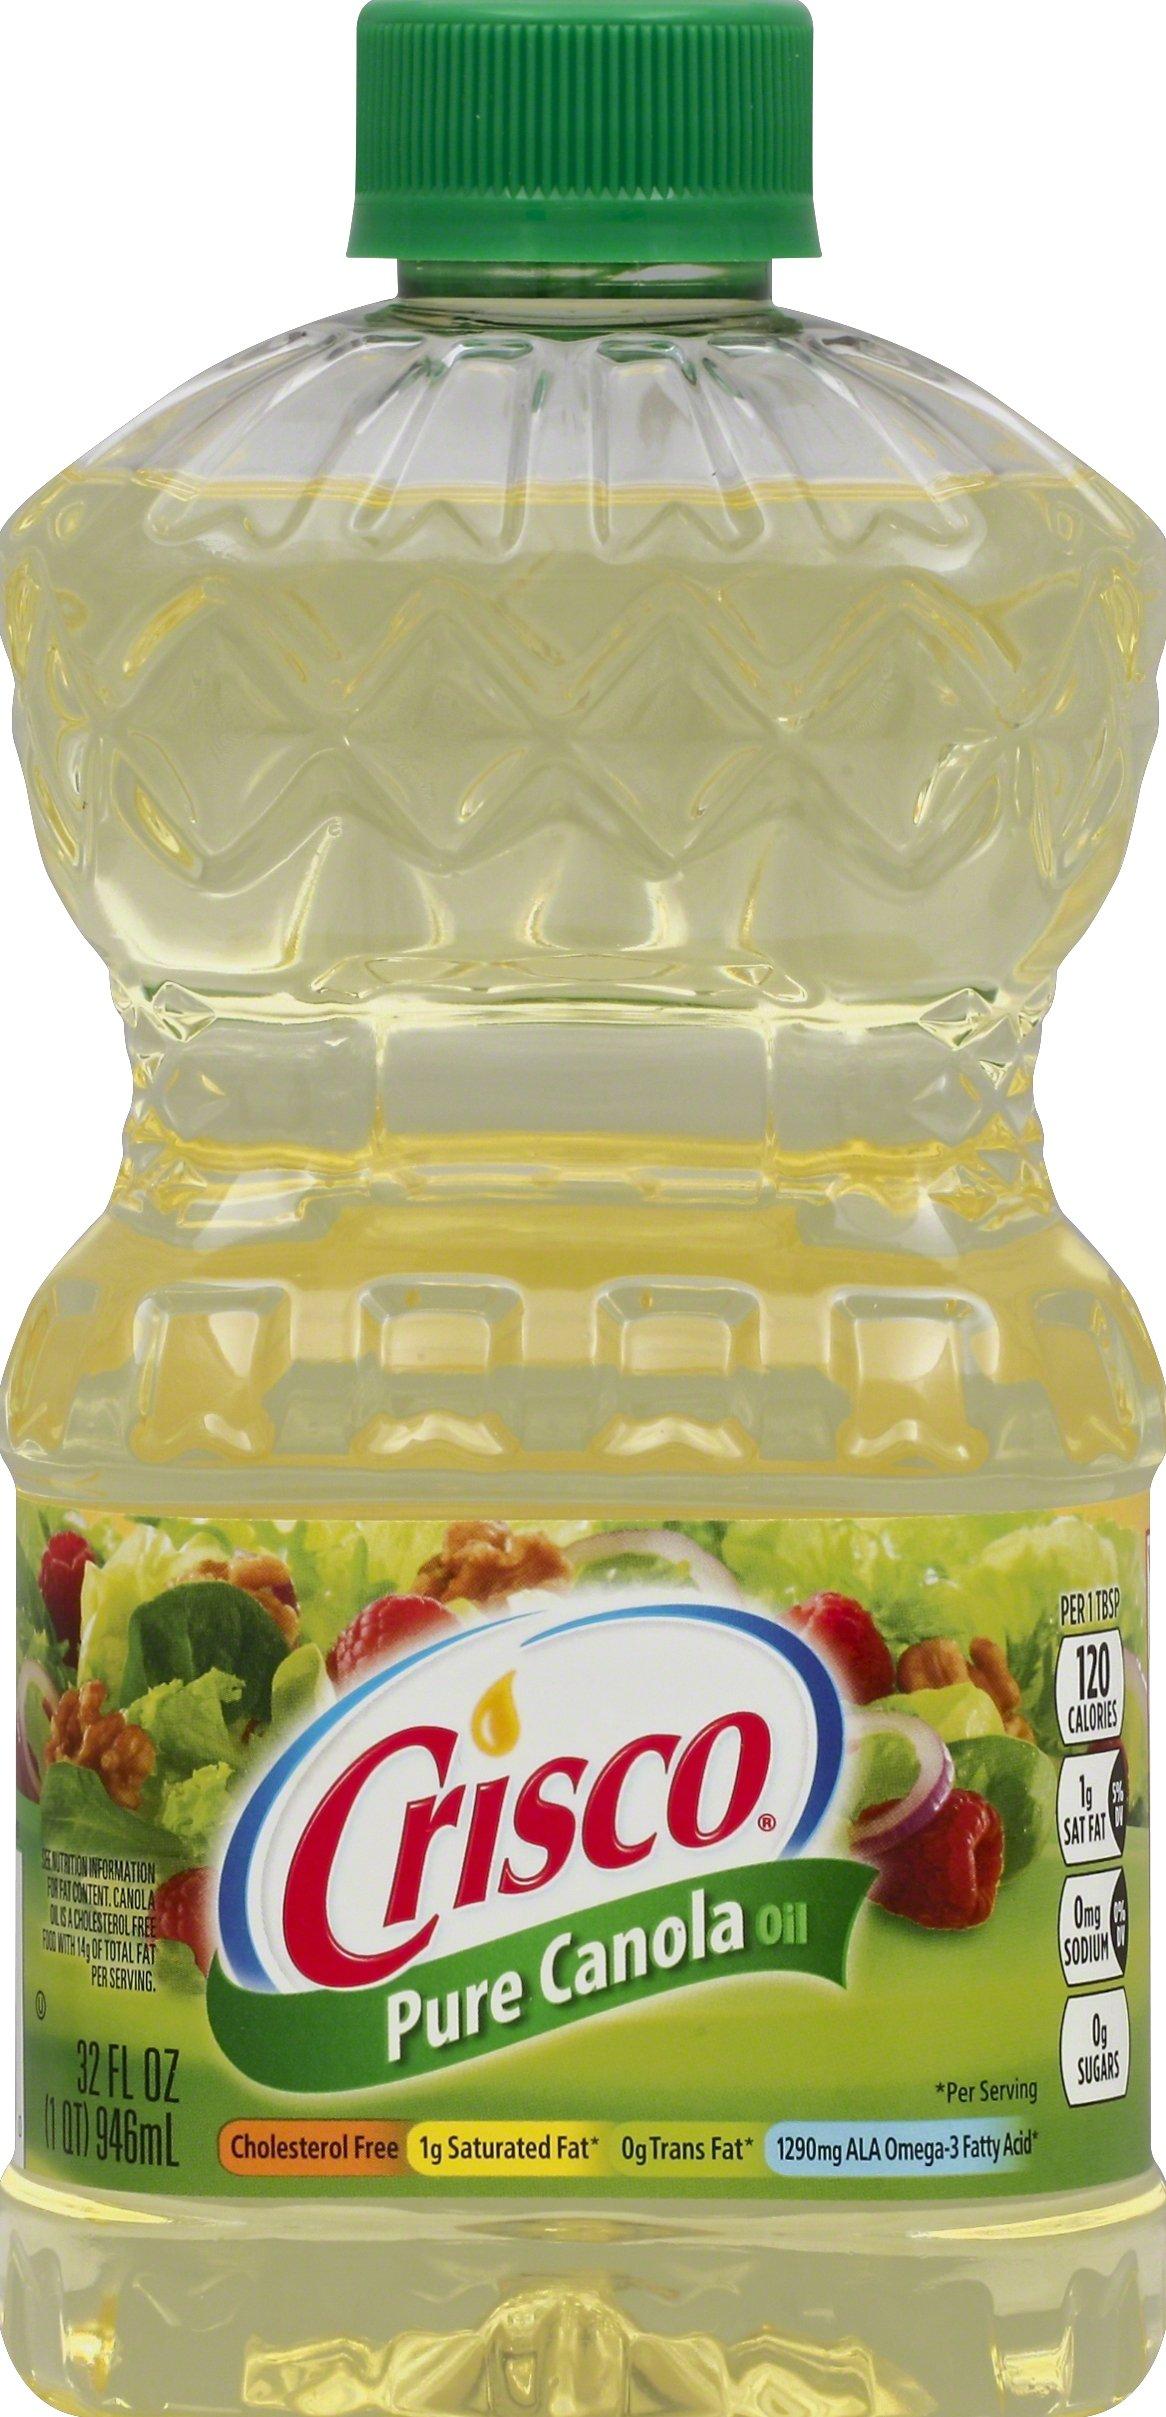 Crisco Pure Canola Oil, 32 Ounce